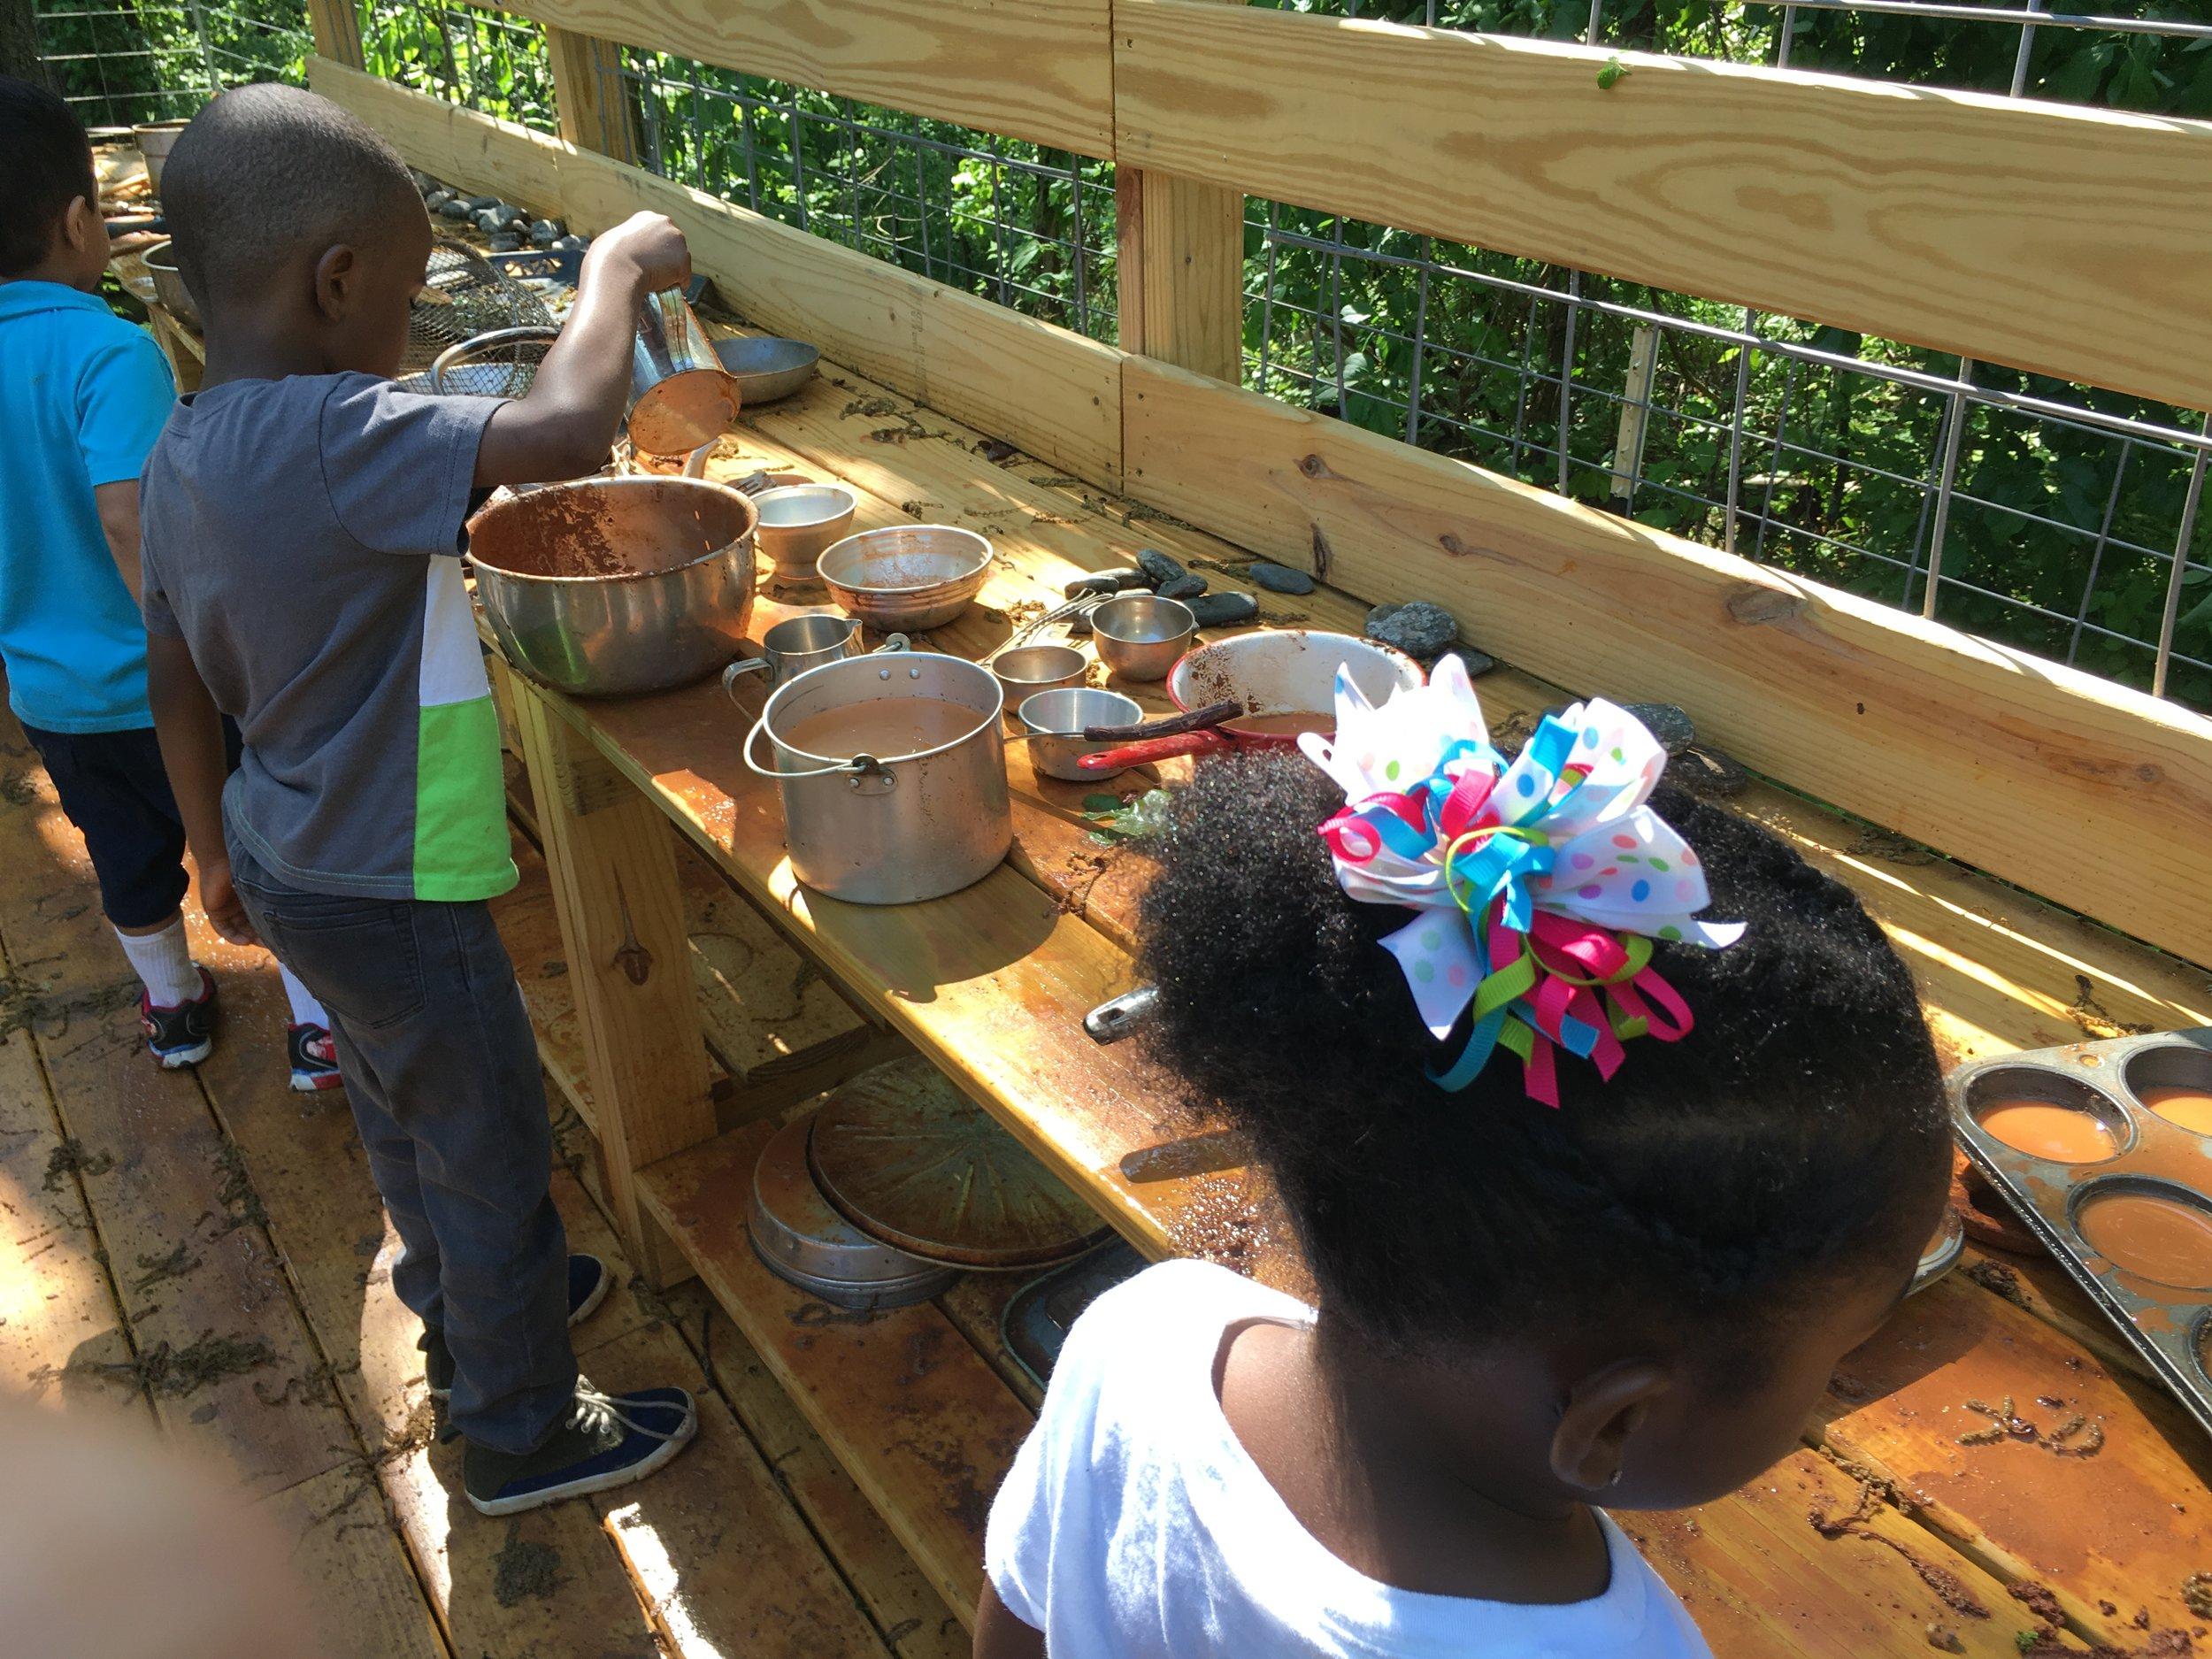 mud kitchen at kinderwoods